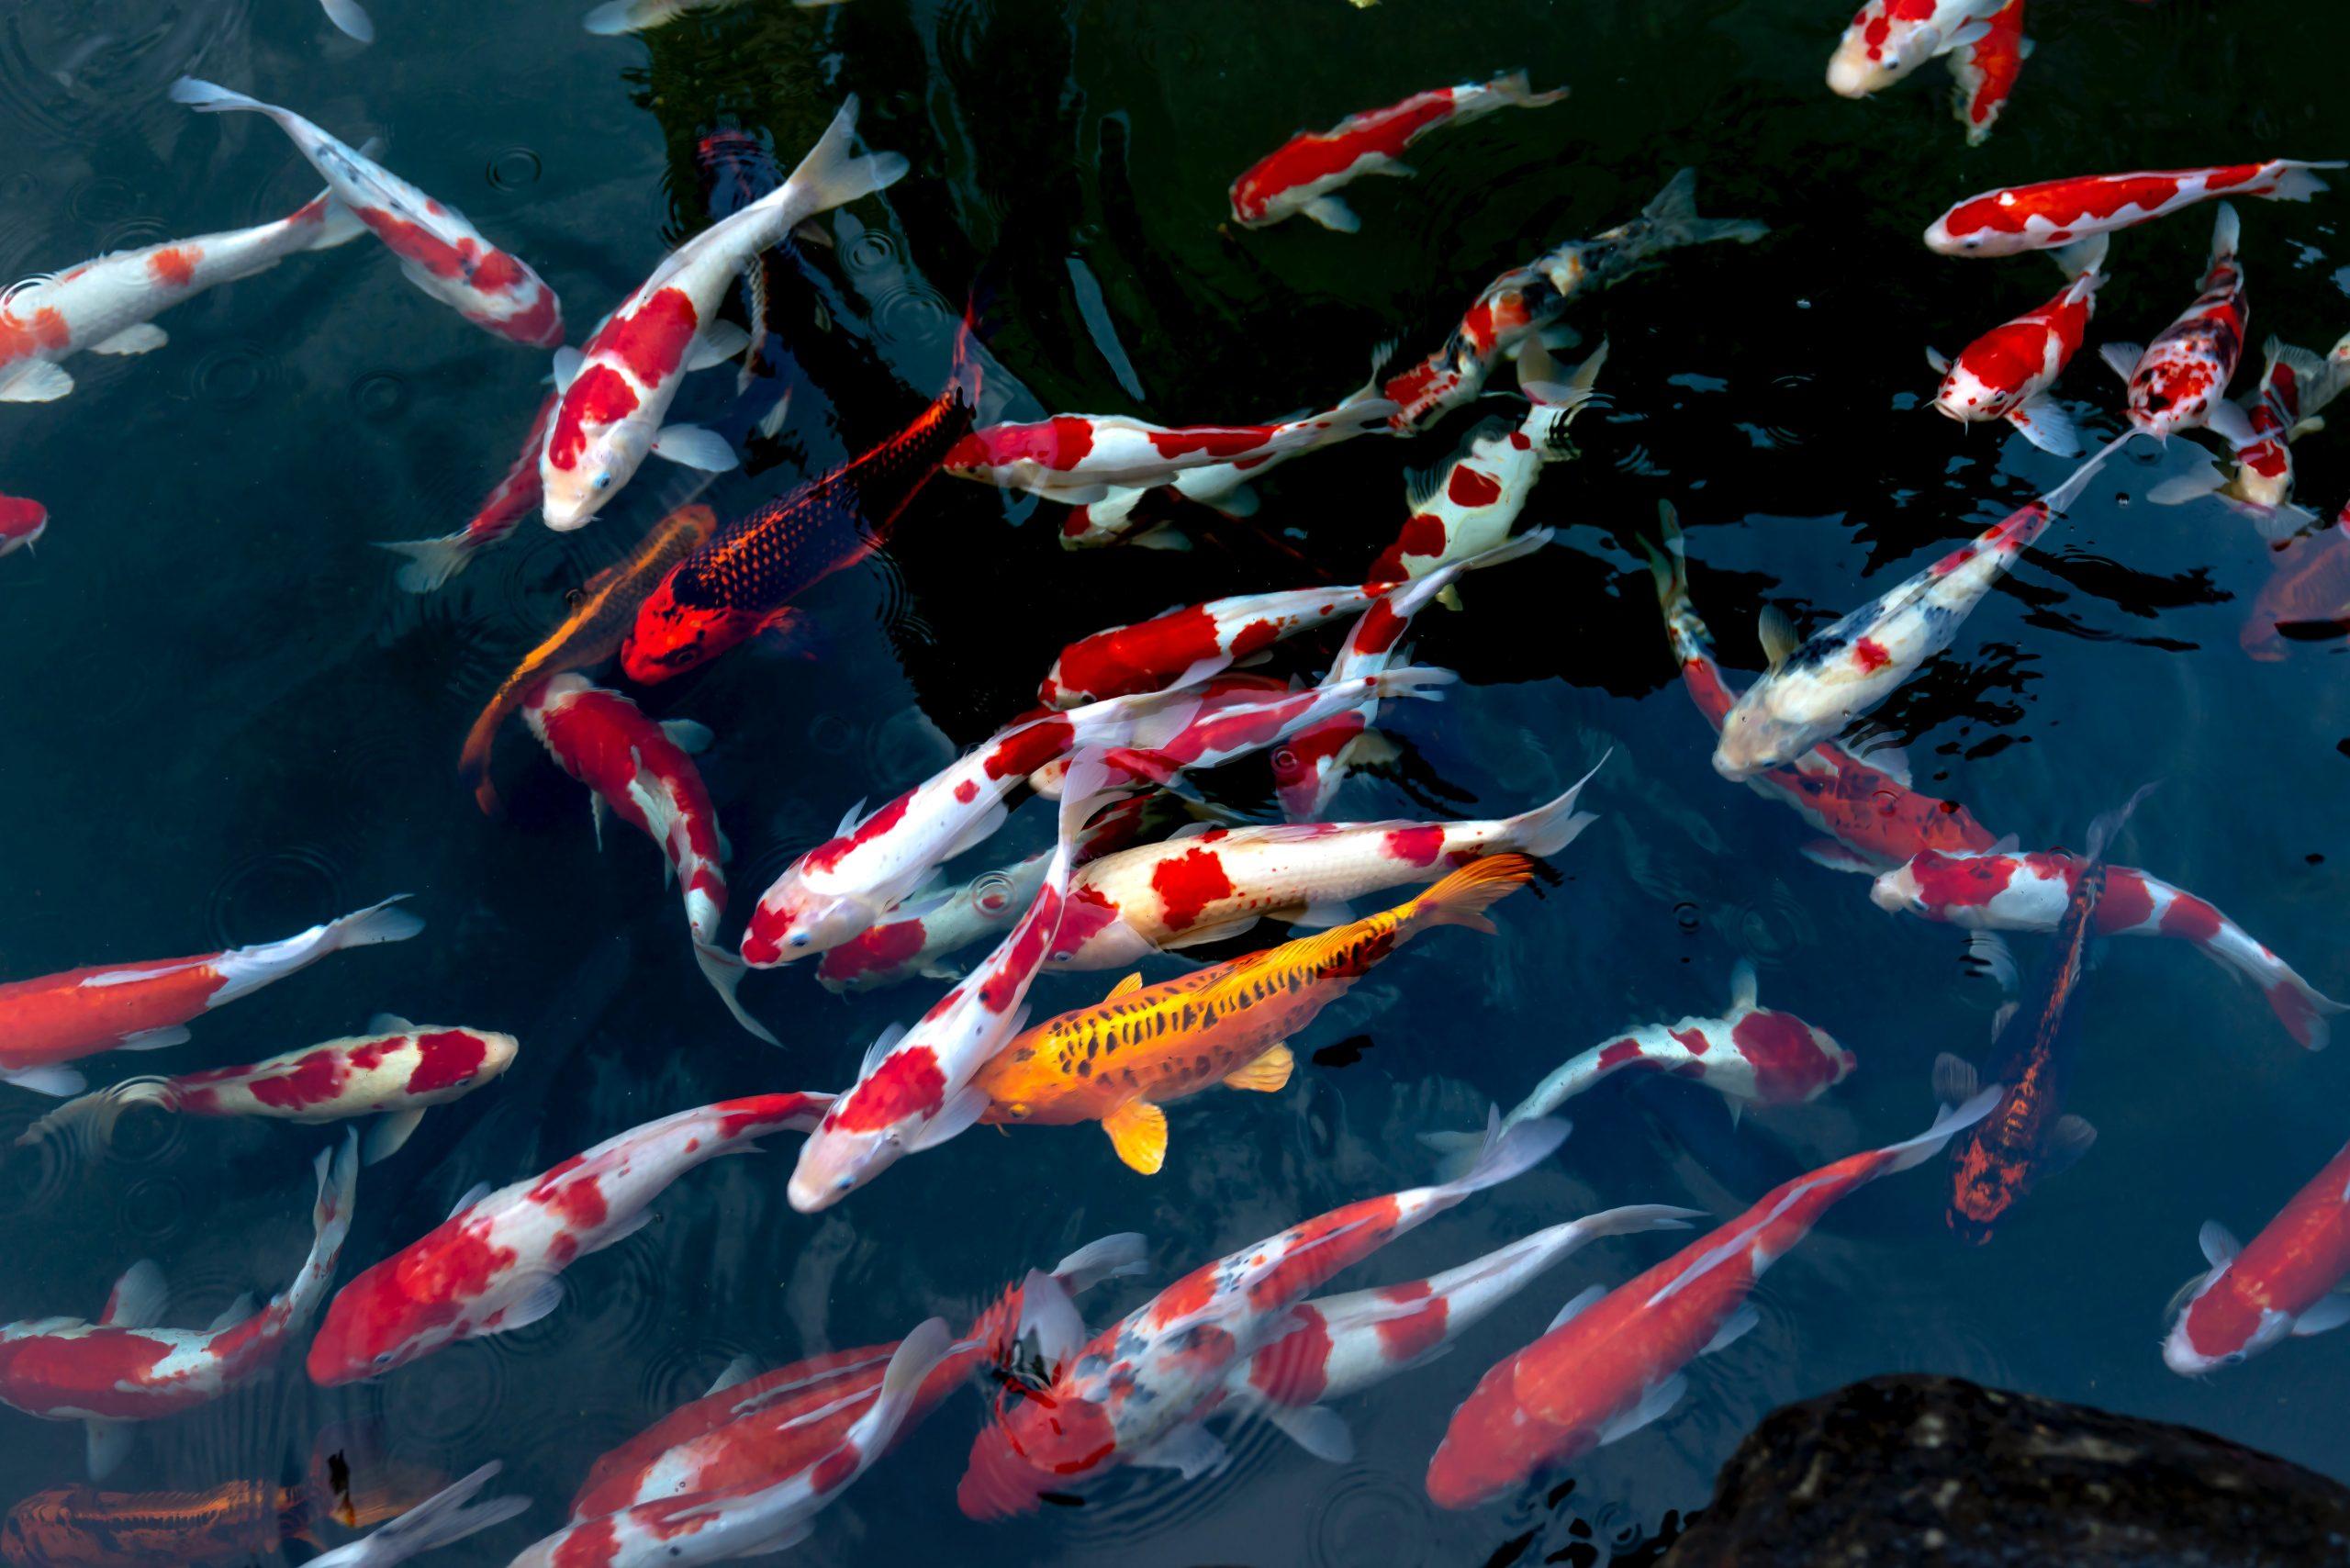 School of fish_Quang Nguyen Vinh_Pexels